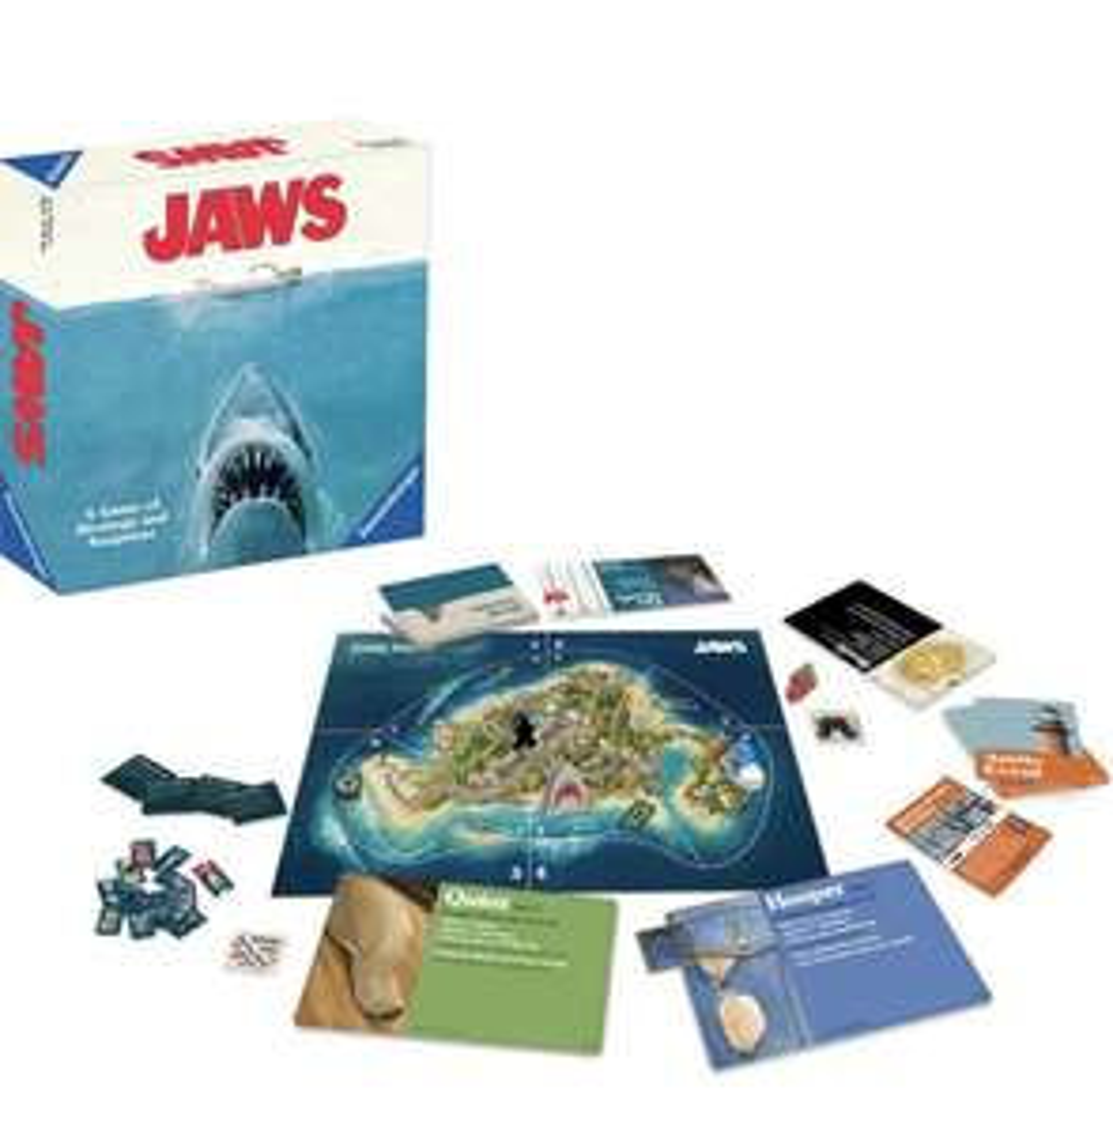 Ravensburger Jaws Strategy Board Game £15 Amazon Prime (+£4.49 Non Prime)